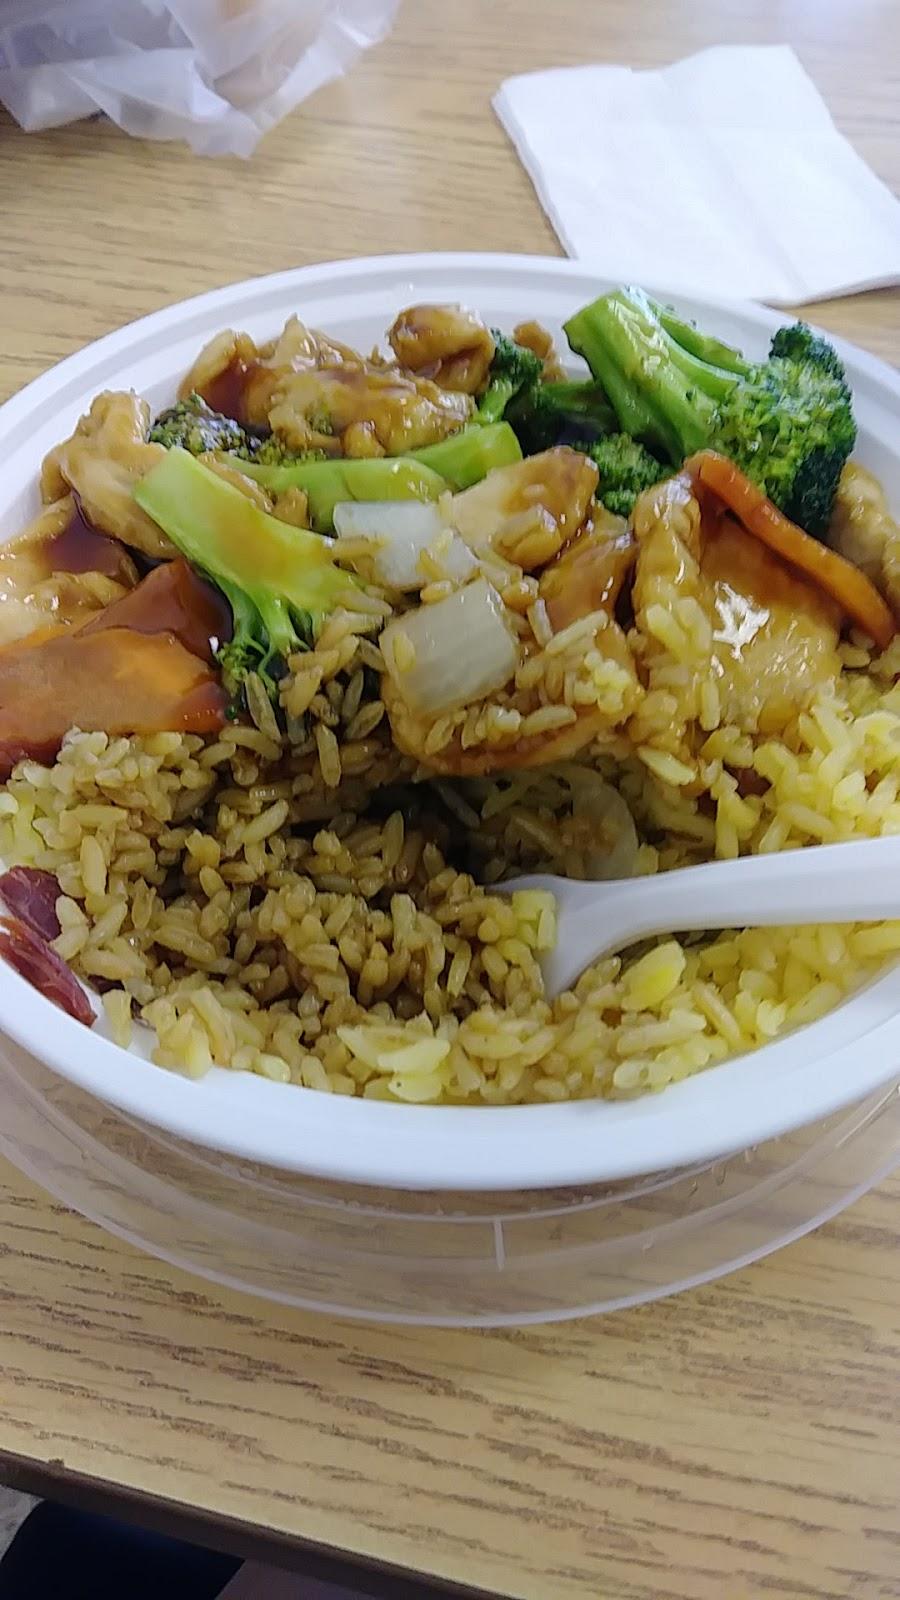 Food King Chinese Restaurant, 2764 Main St, Newfane, NY 14108, USA